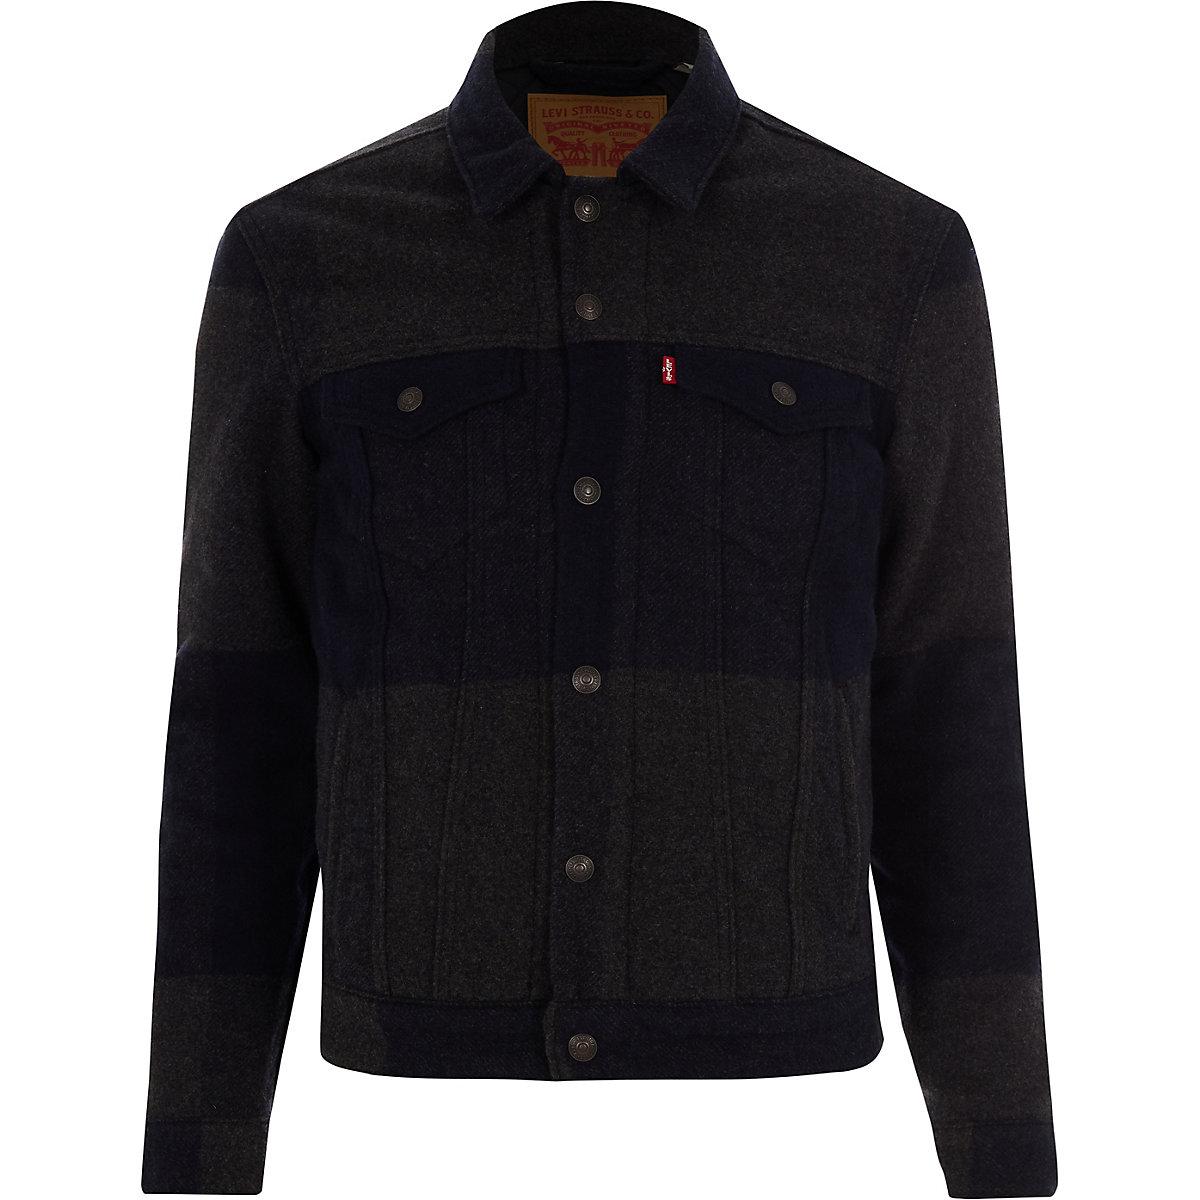 Levi's grey wool plaid trucker jacket